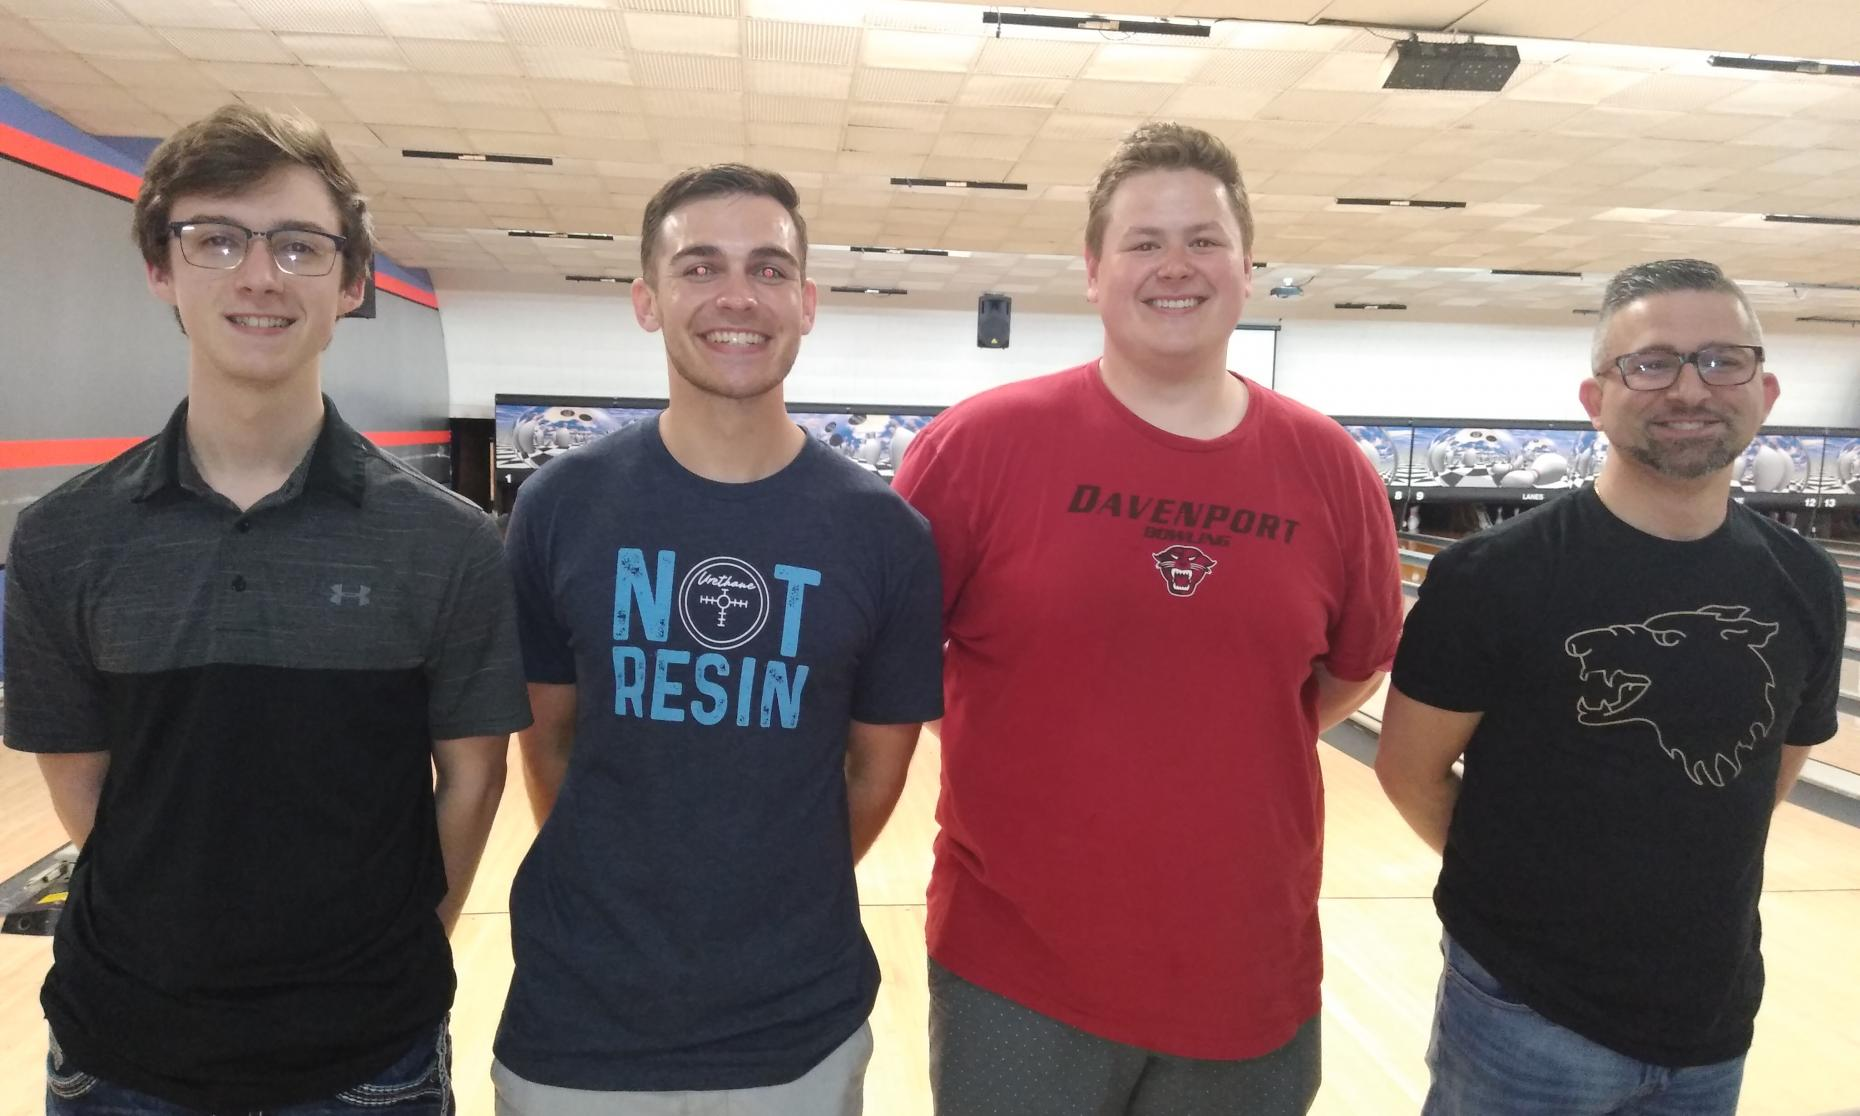 Champion Marcus McClain, Runner-Up Mike Jachcinski, Bryan Eaton, and Frank Testa